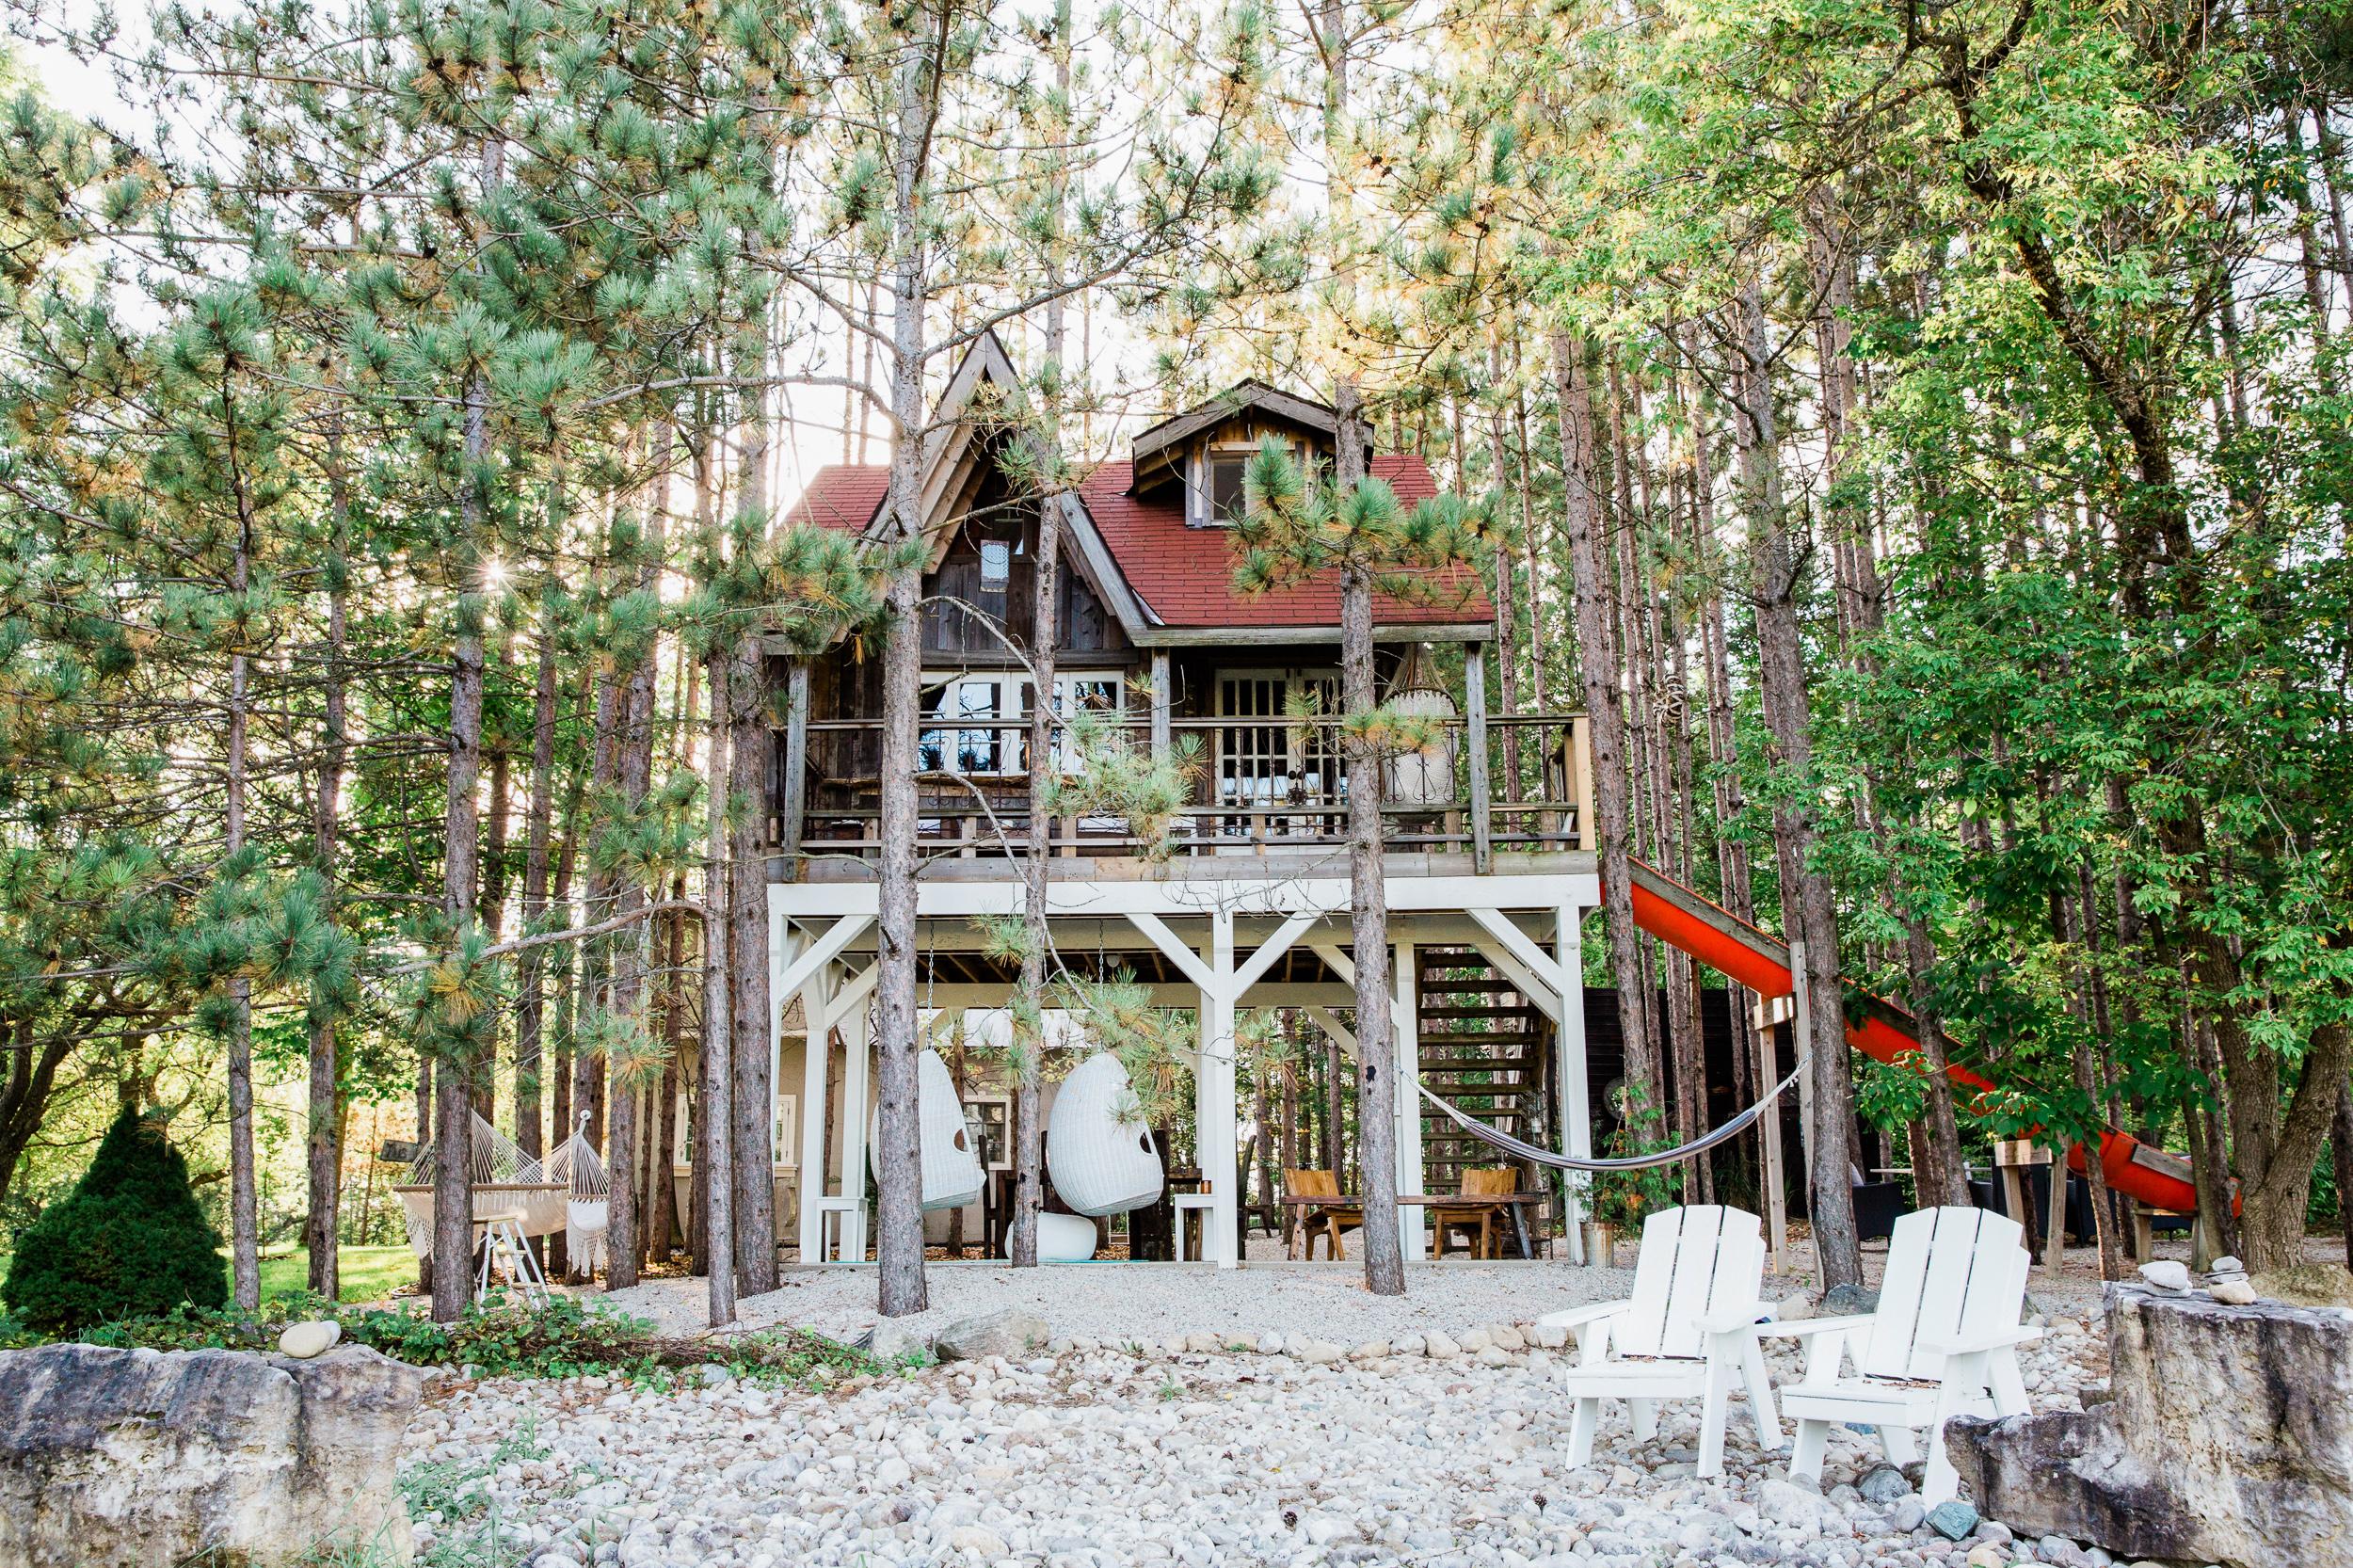 Lynn Knowlton's Treehouse